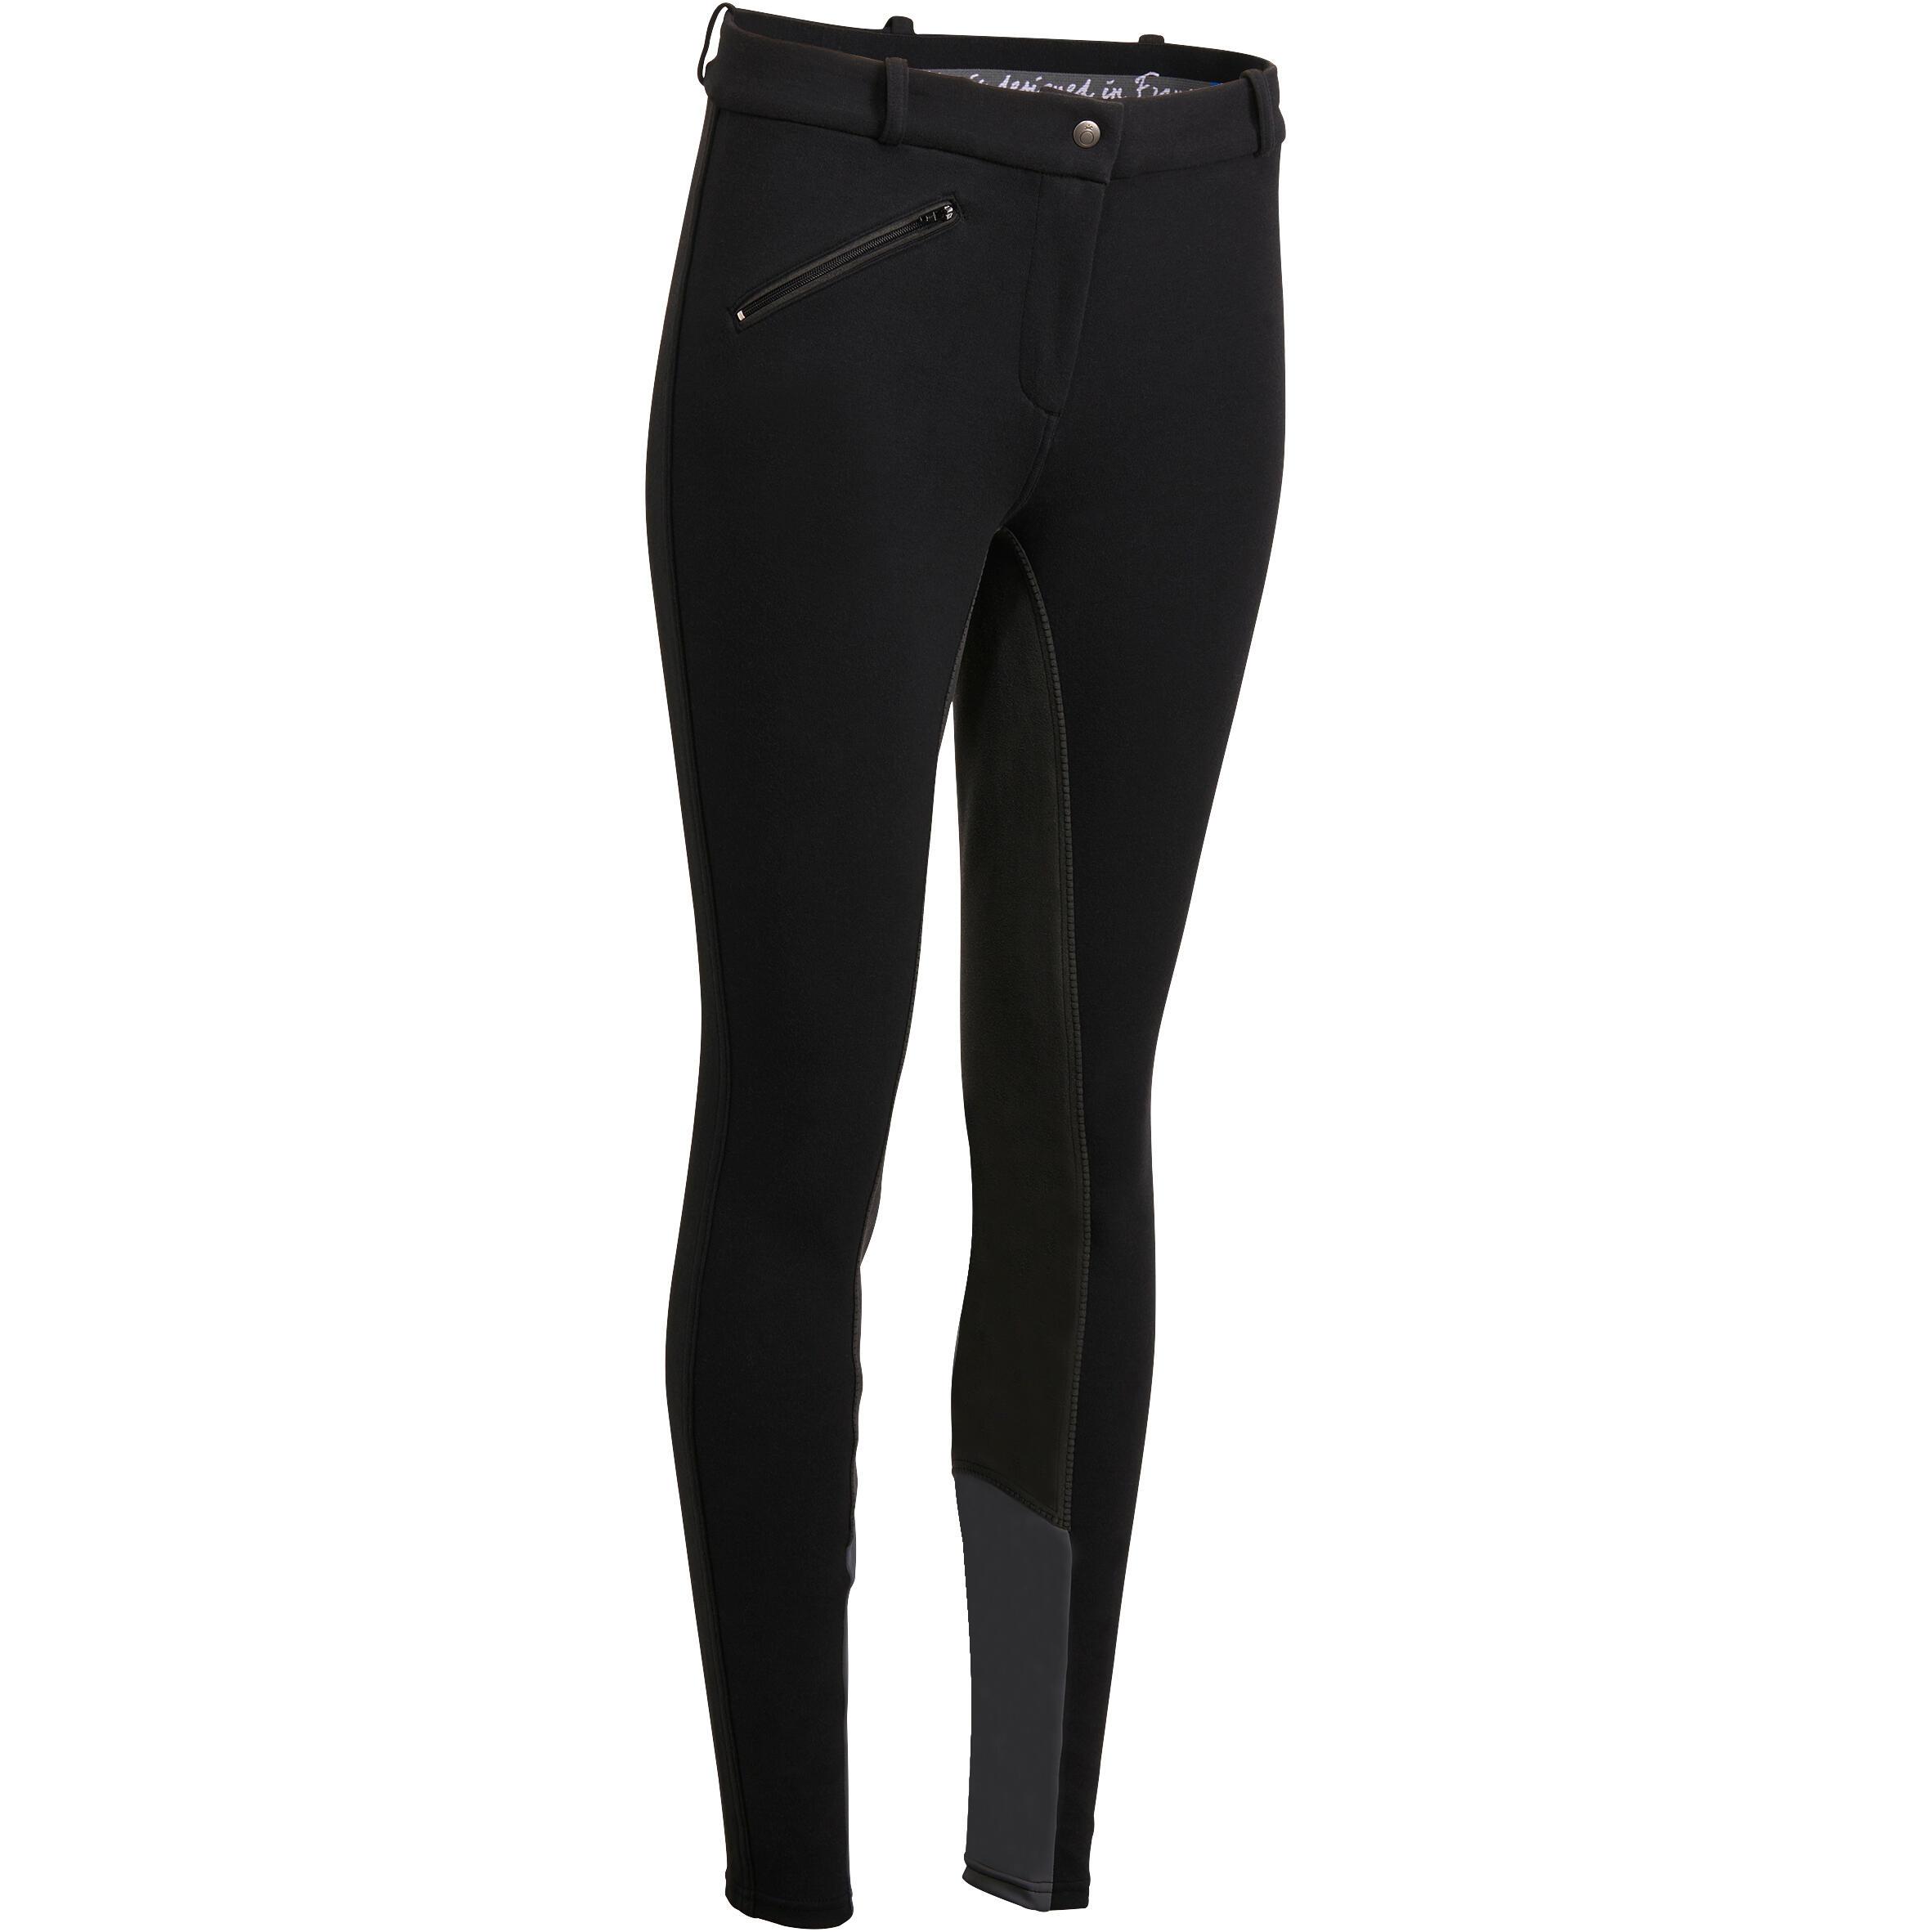 Pantalon 180 FULLSEAT Damă la Reducere poza